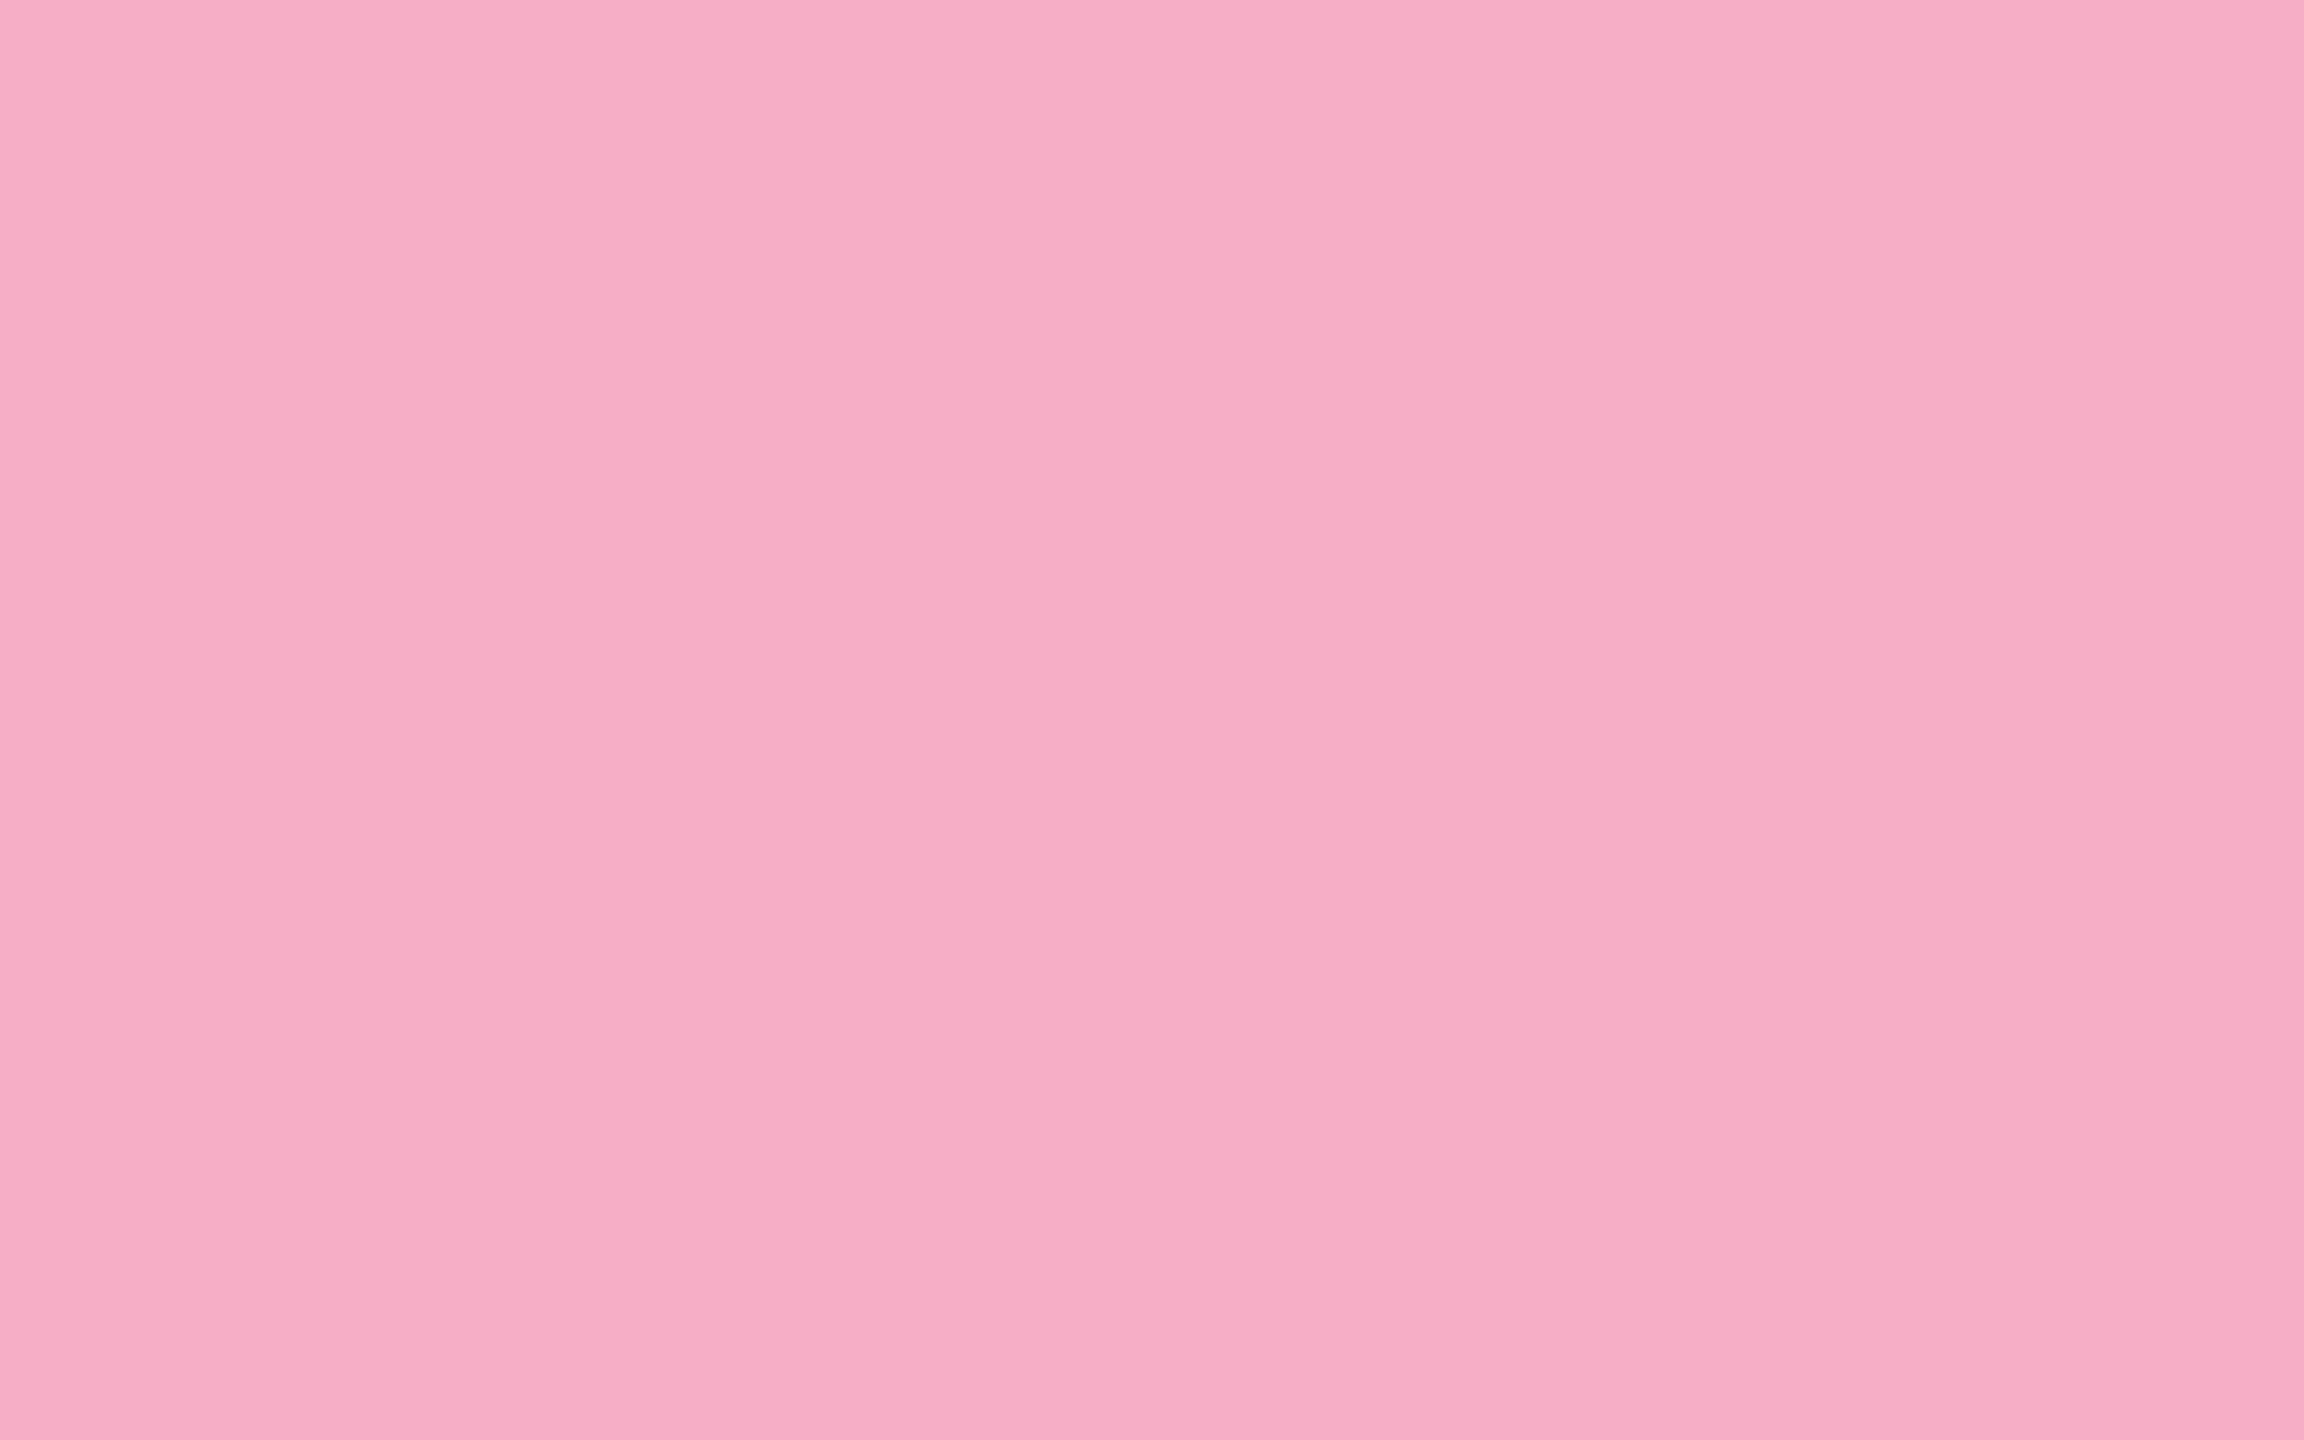 2304x1440 Nadeshiko Pink Solid Color Background